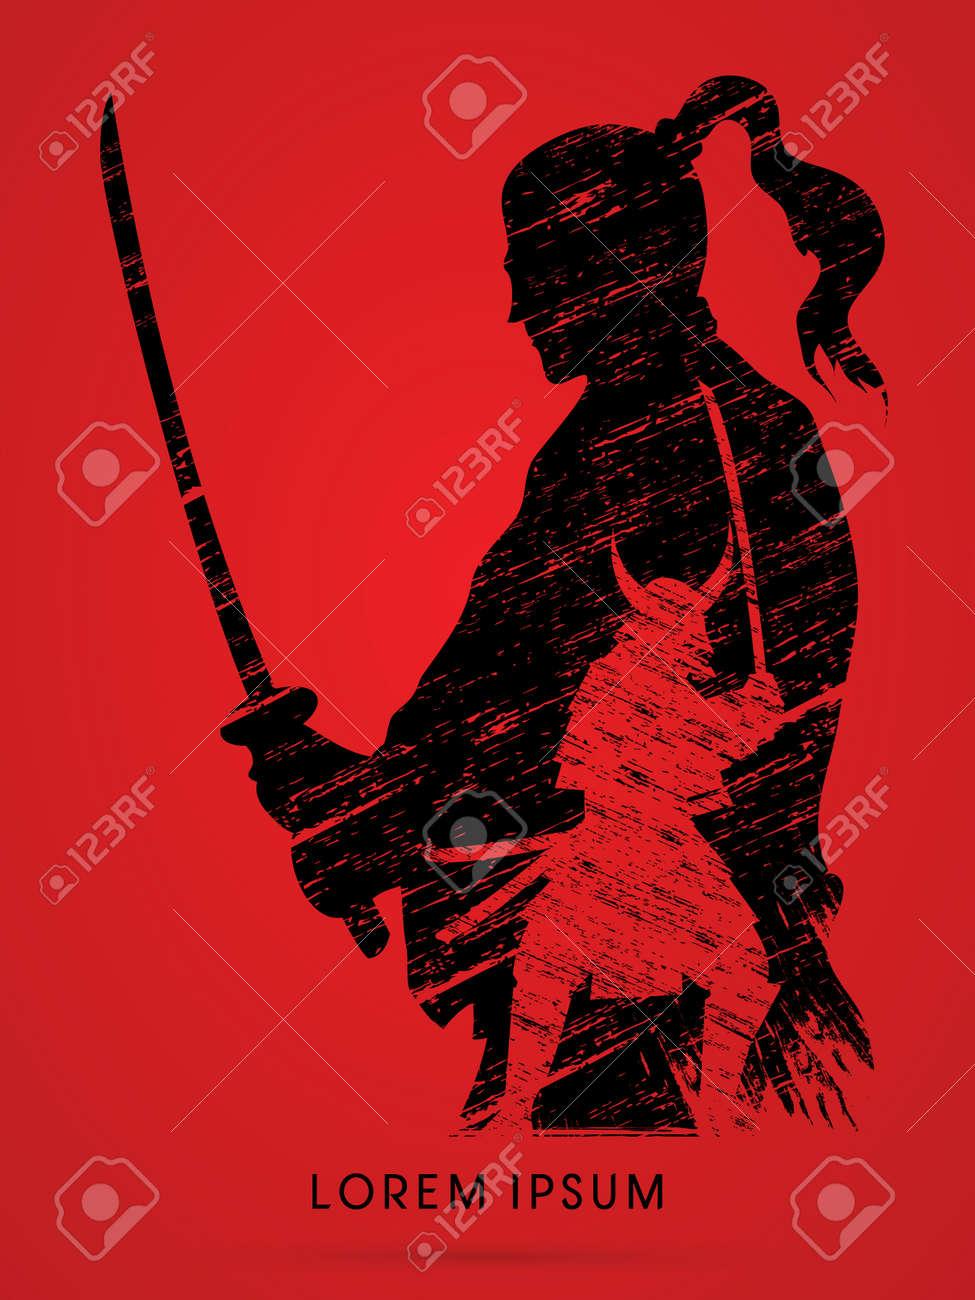 Silhouette Samurai, Ready to fight designed using grunge brush graphic vector - 52803954